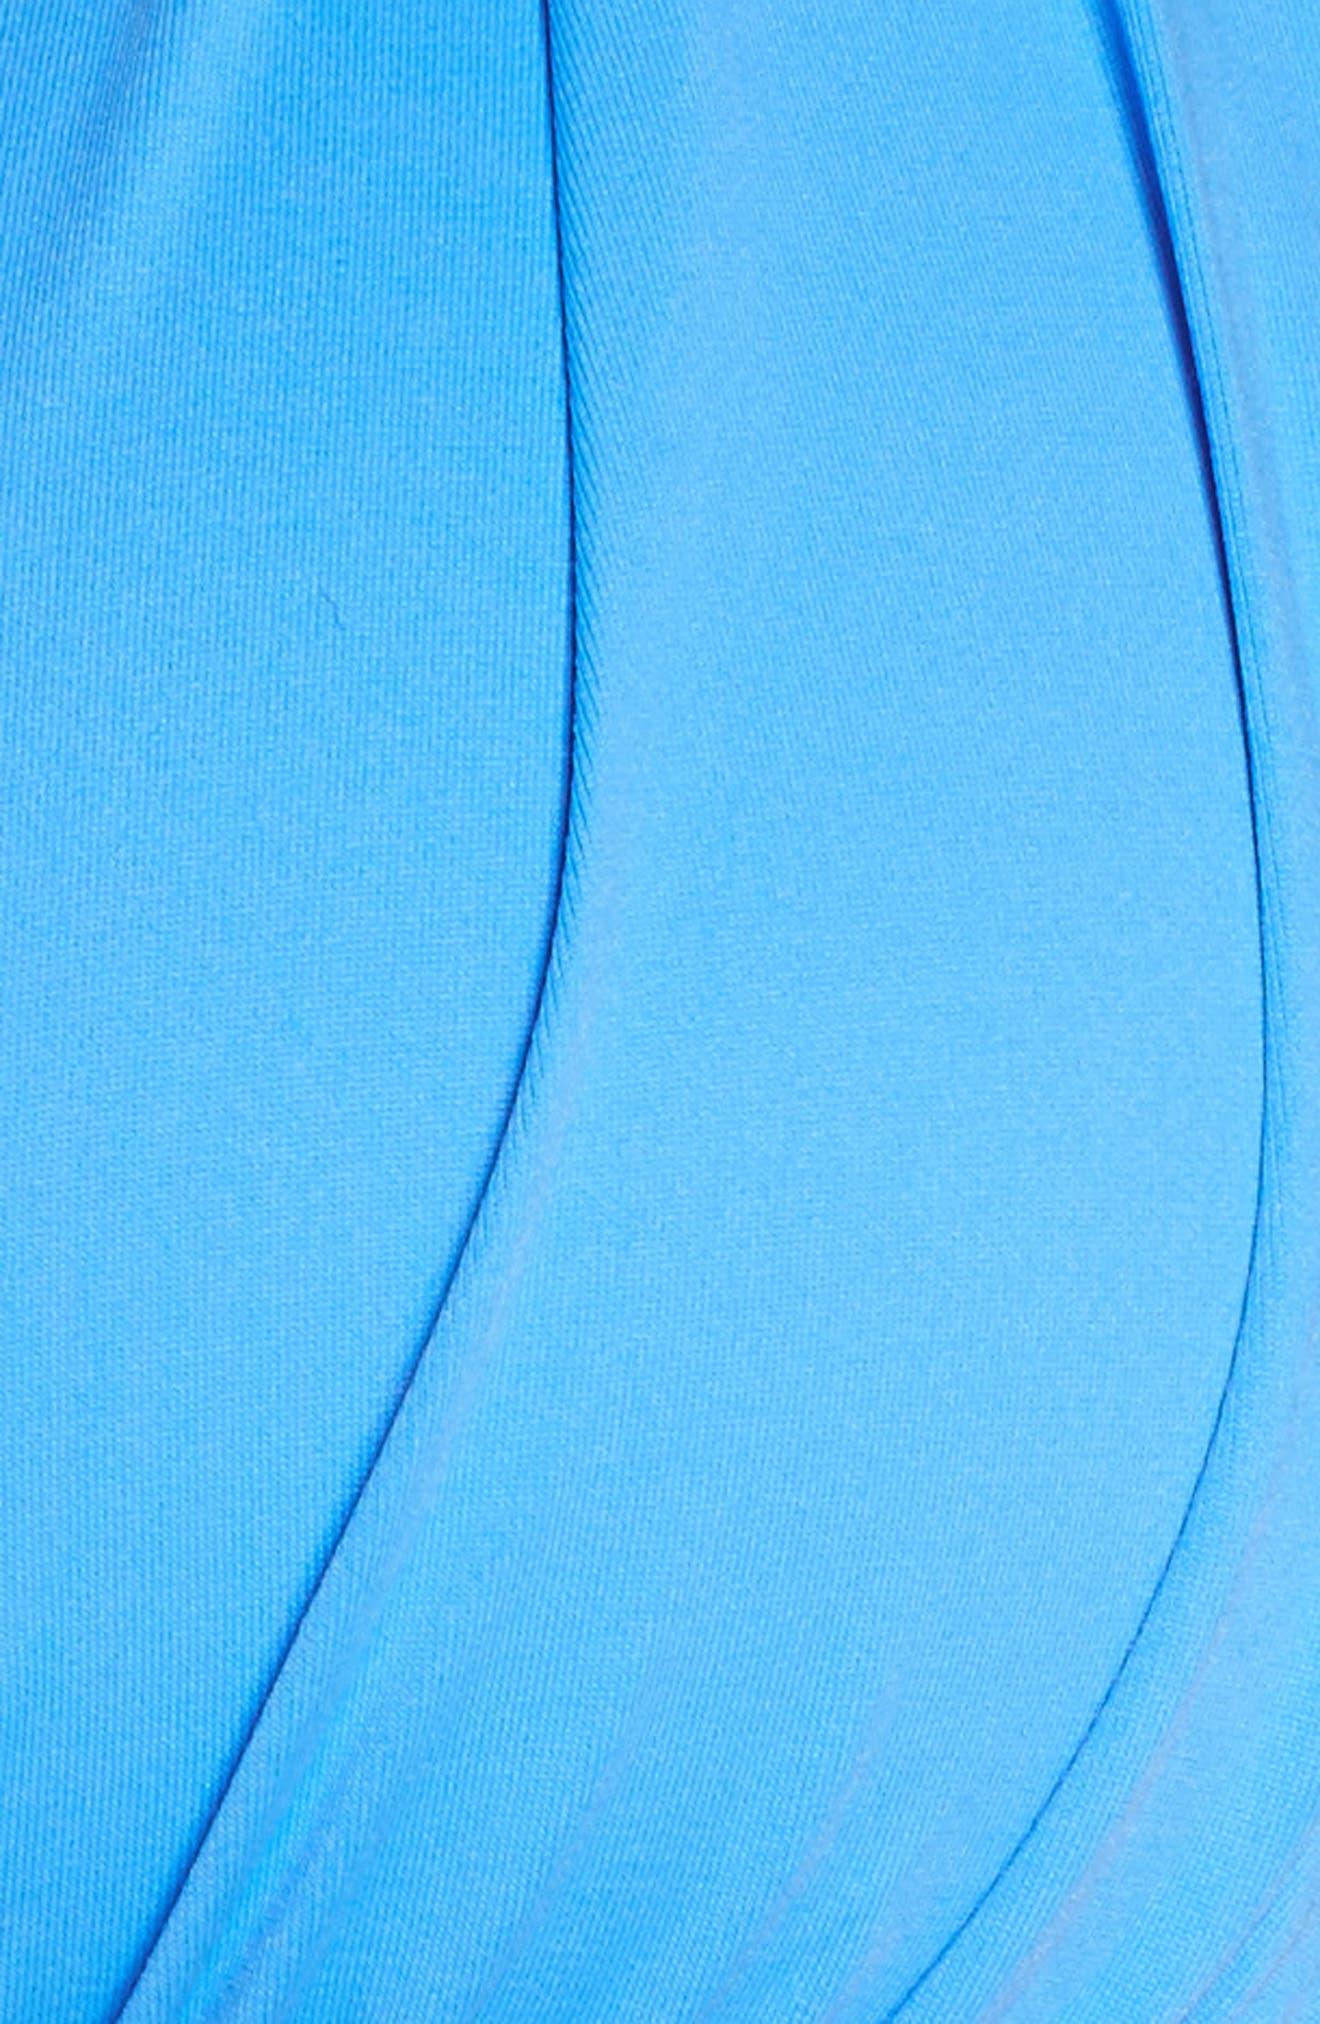 Island Blanca Halter Bikini Top,                             Alternate thumbnail 10, color,                             Blue Suede